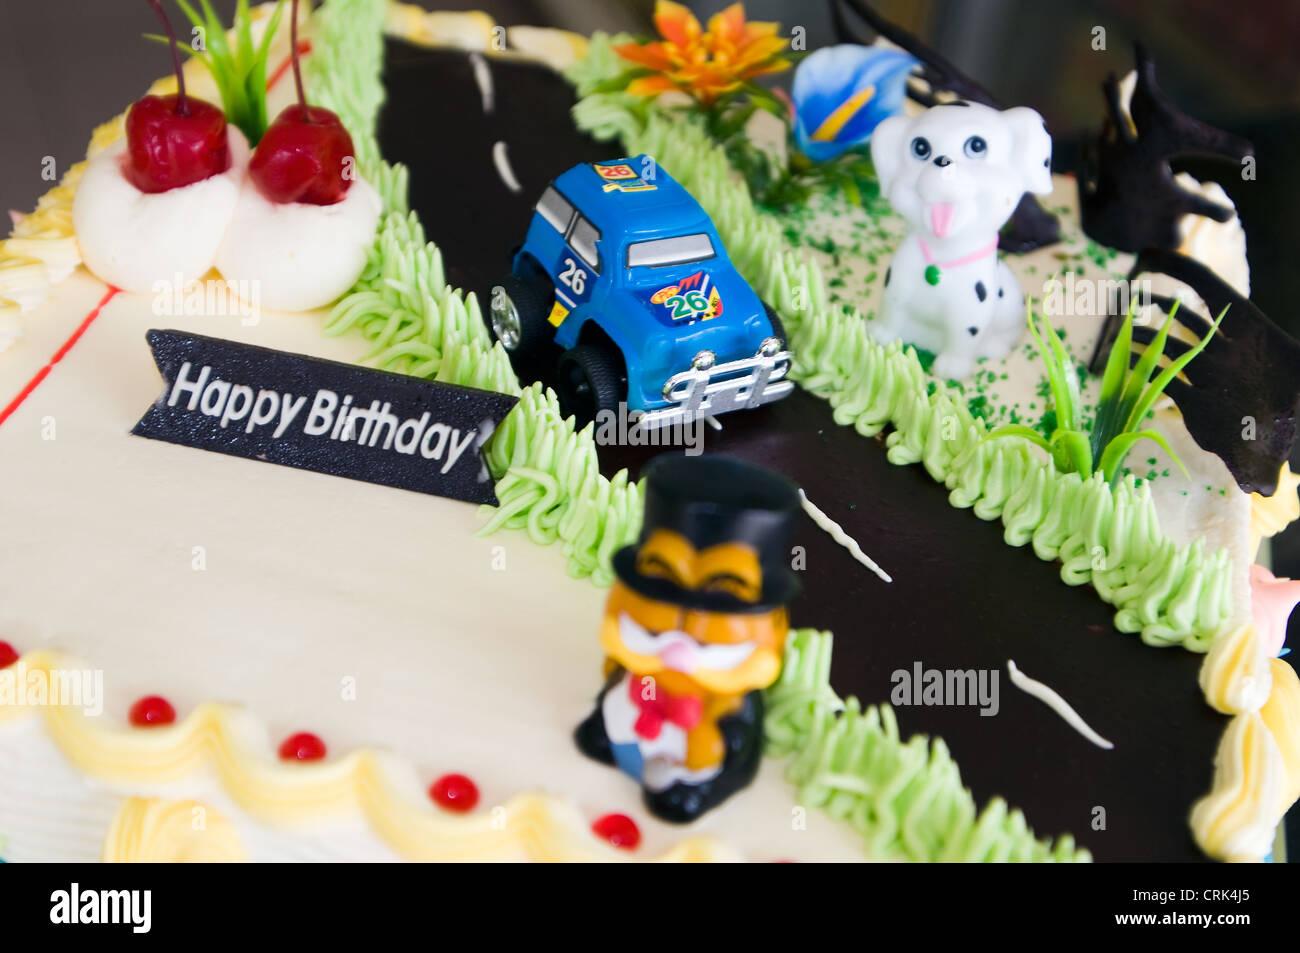 birthday cake in bakery nagoya batam riau islands indonesia Stock